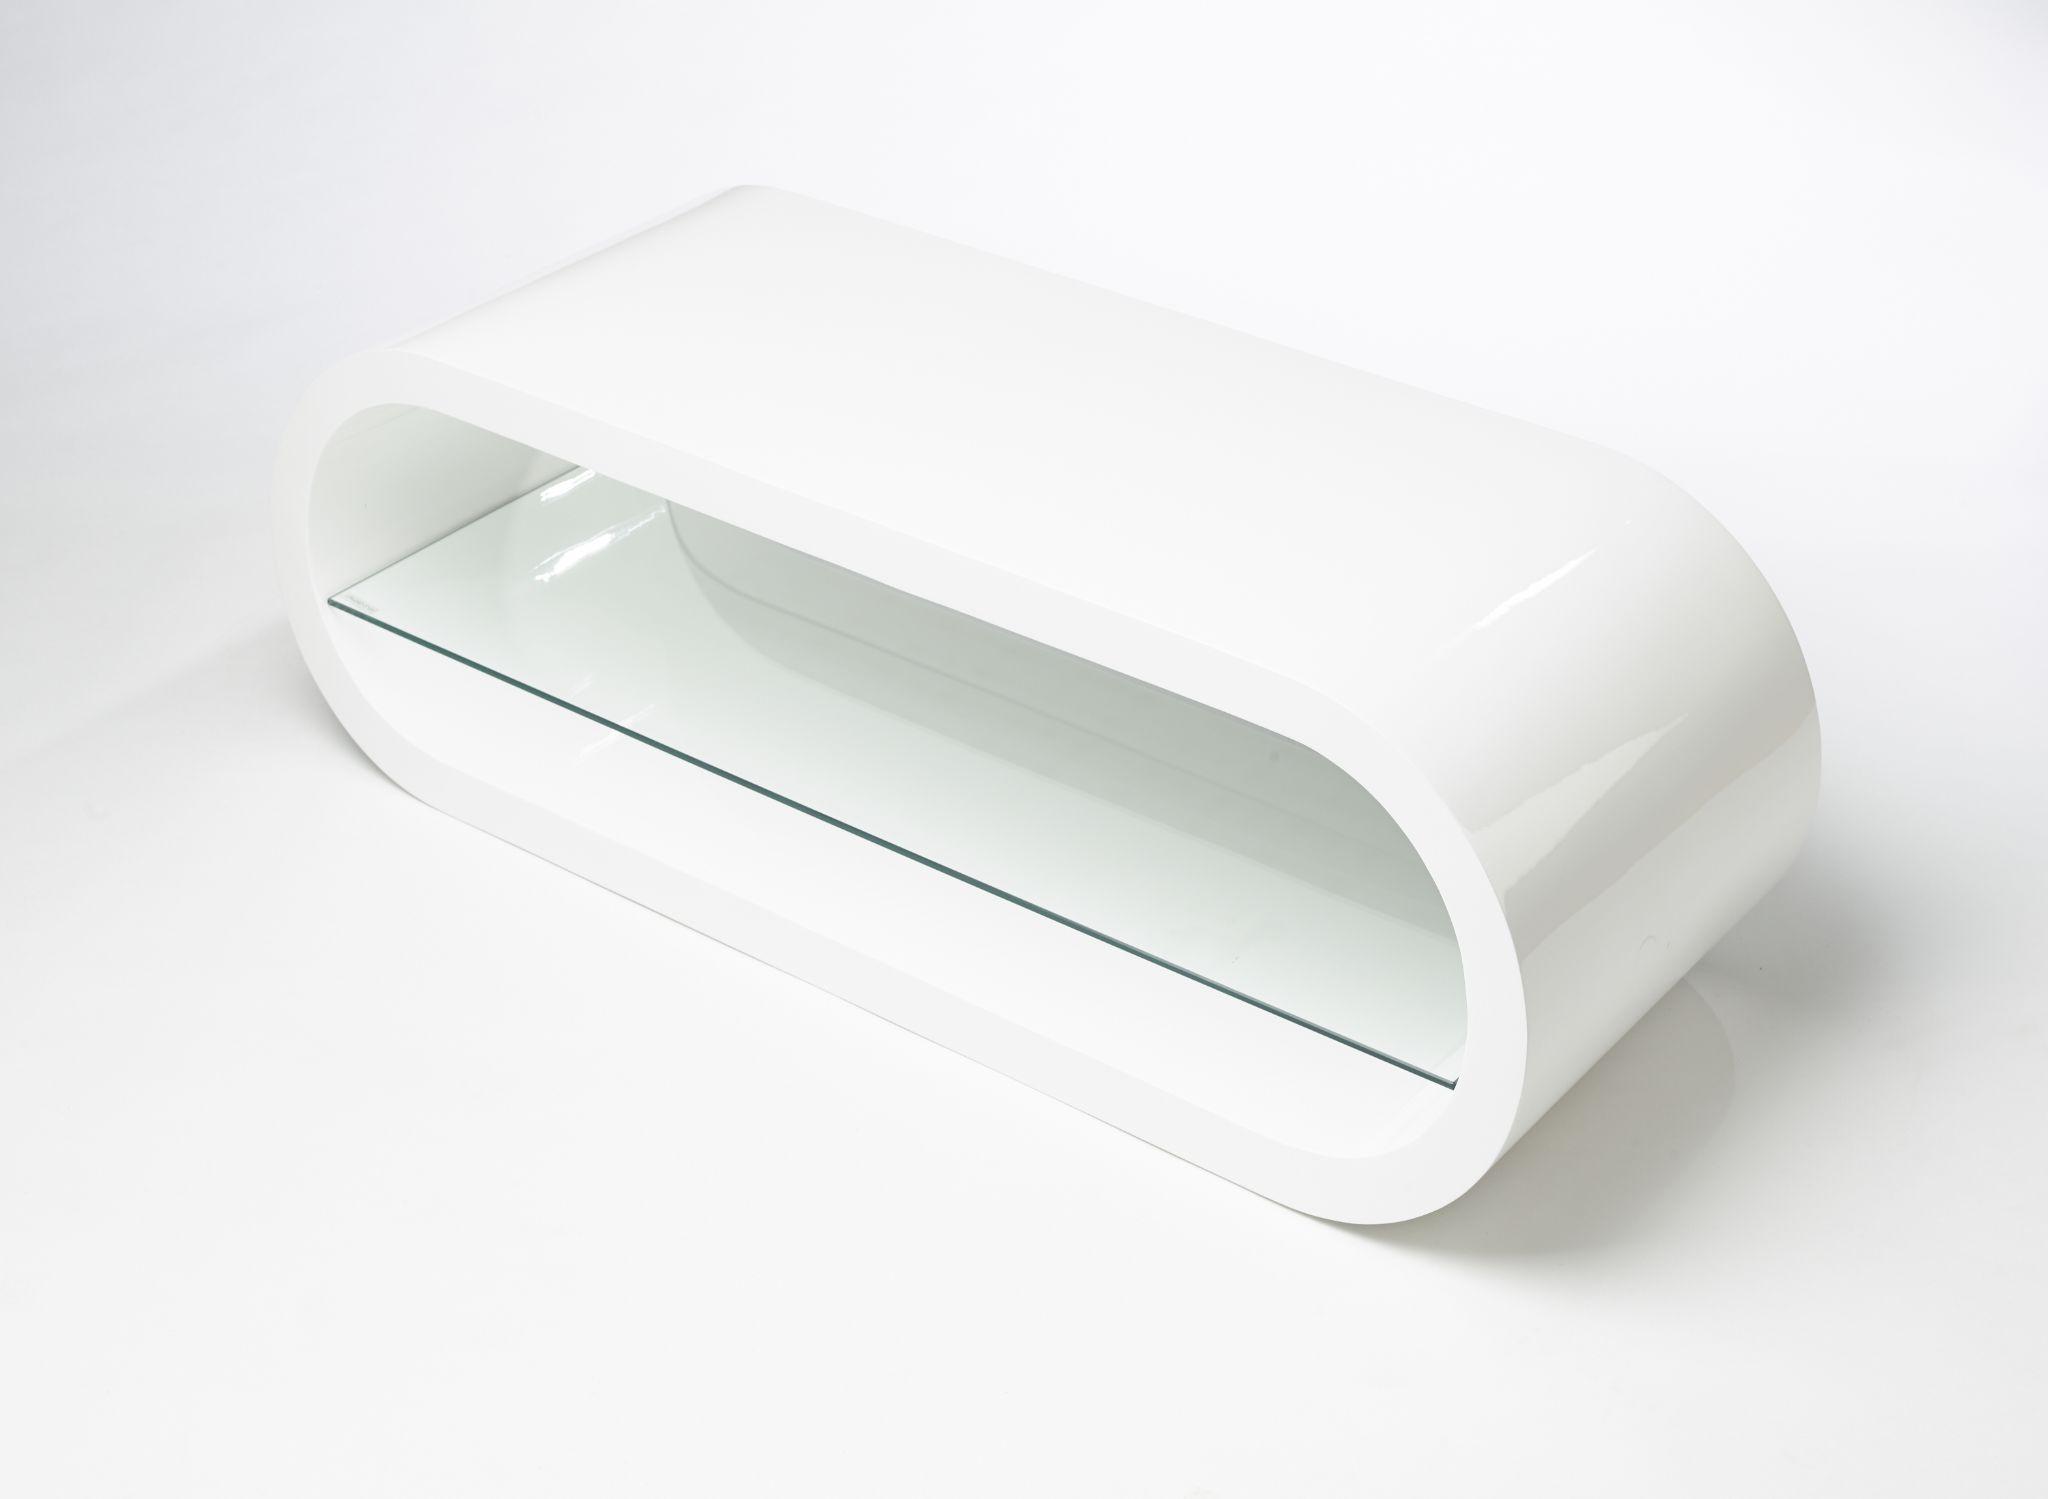 Recent Modern Designer High Gloss Oval Tv Stand Cabinet High White Gloss Within White Gloss Oval Tv Stands (Gallery 1 of 20)